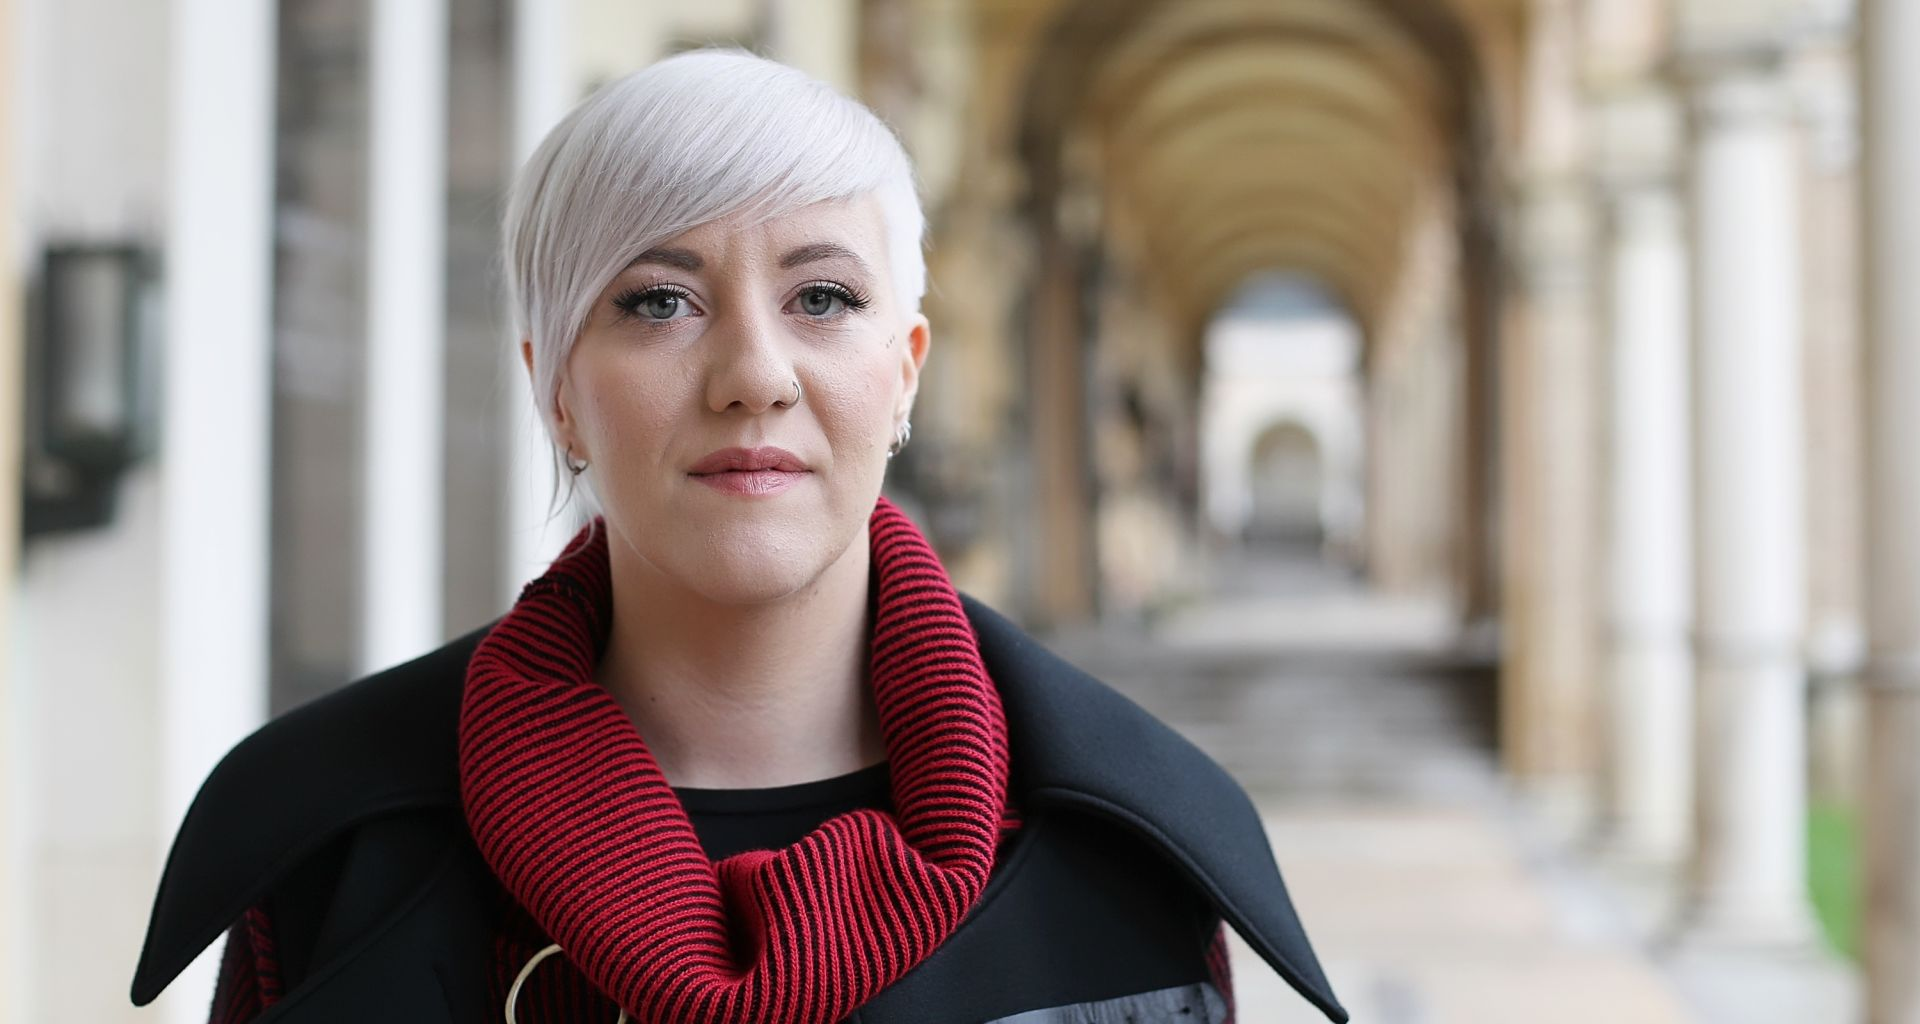 Hrvatsko društvo skladatelja razočarano načinom izbora pjesme za Eurosong